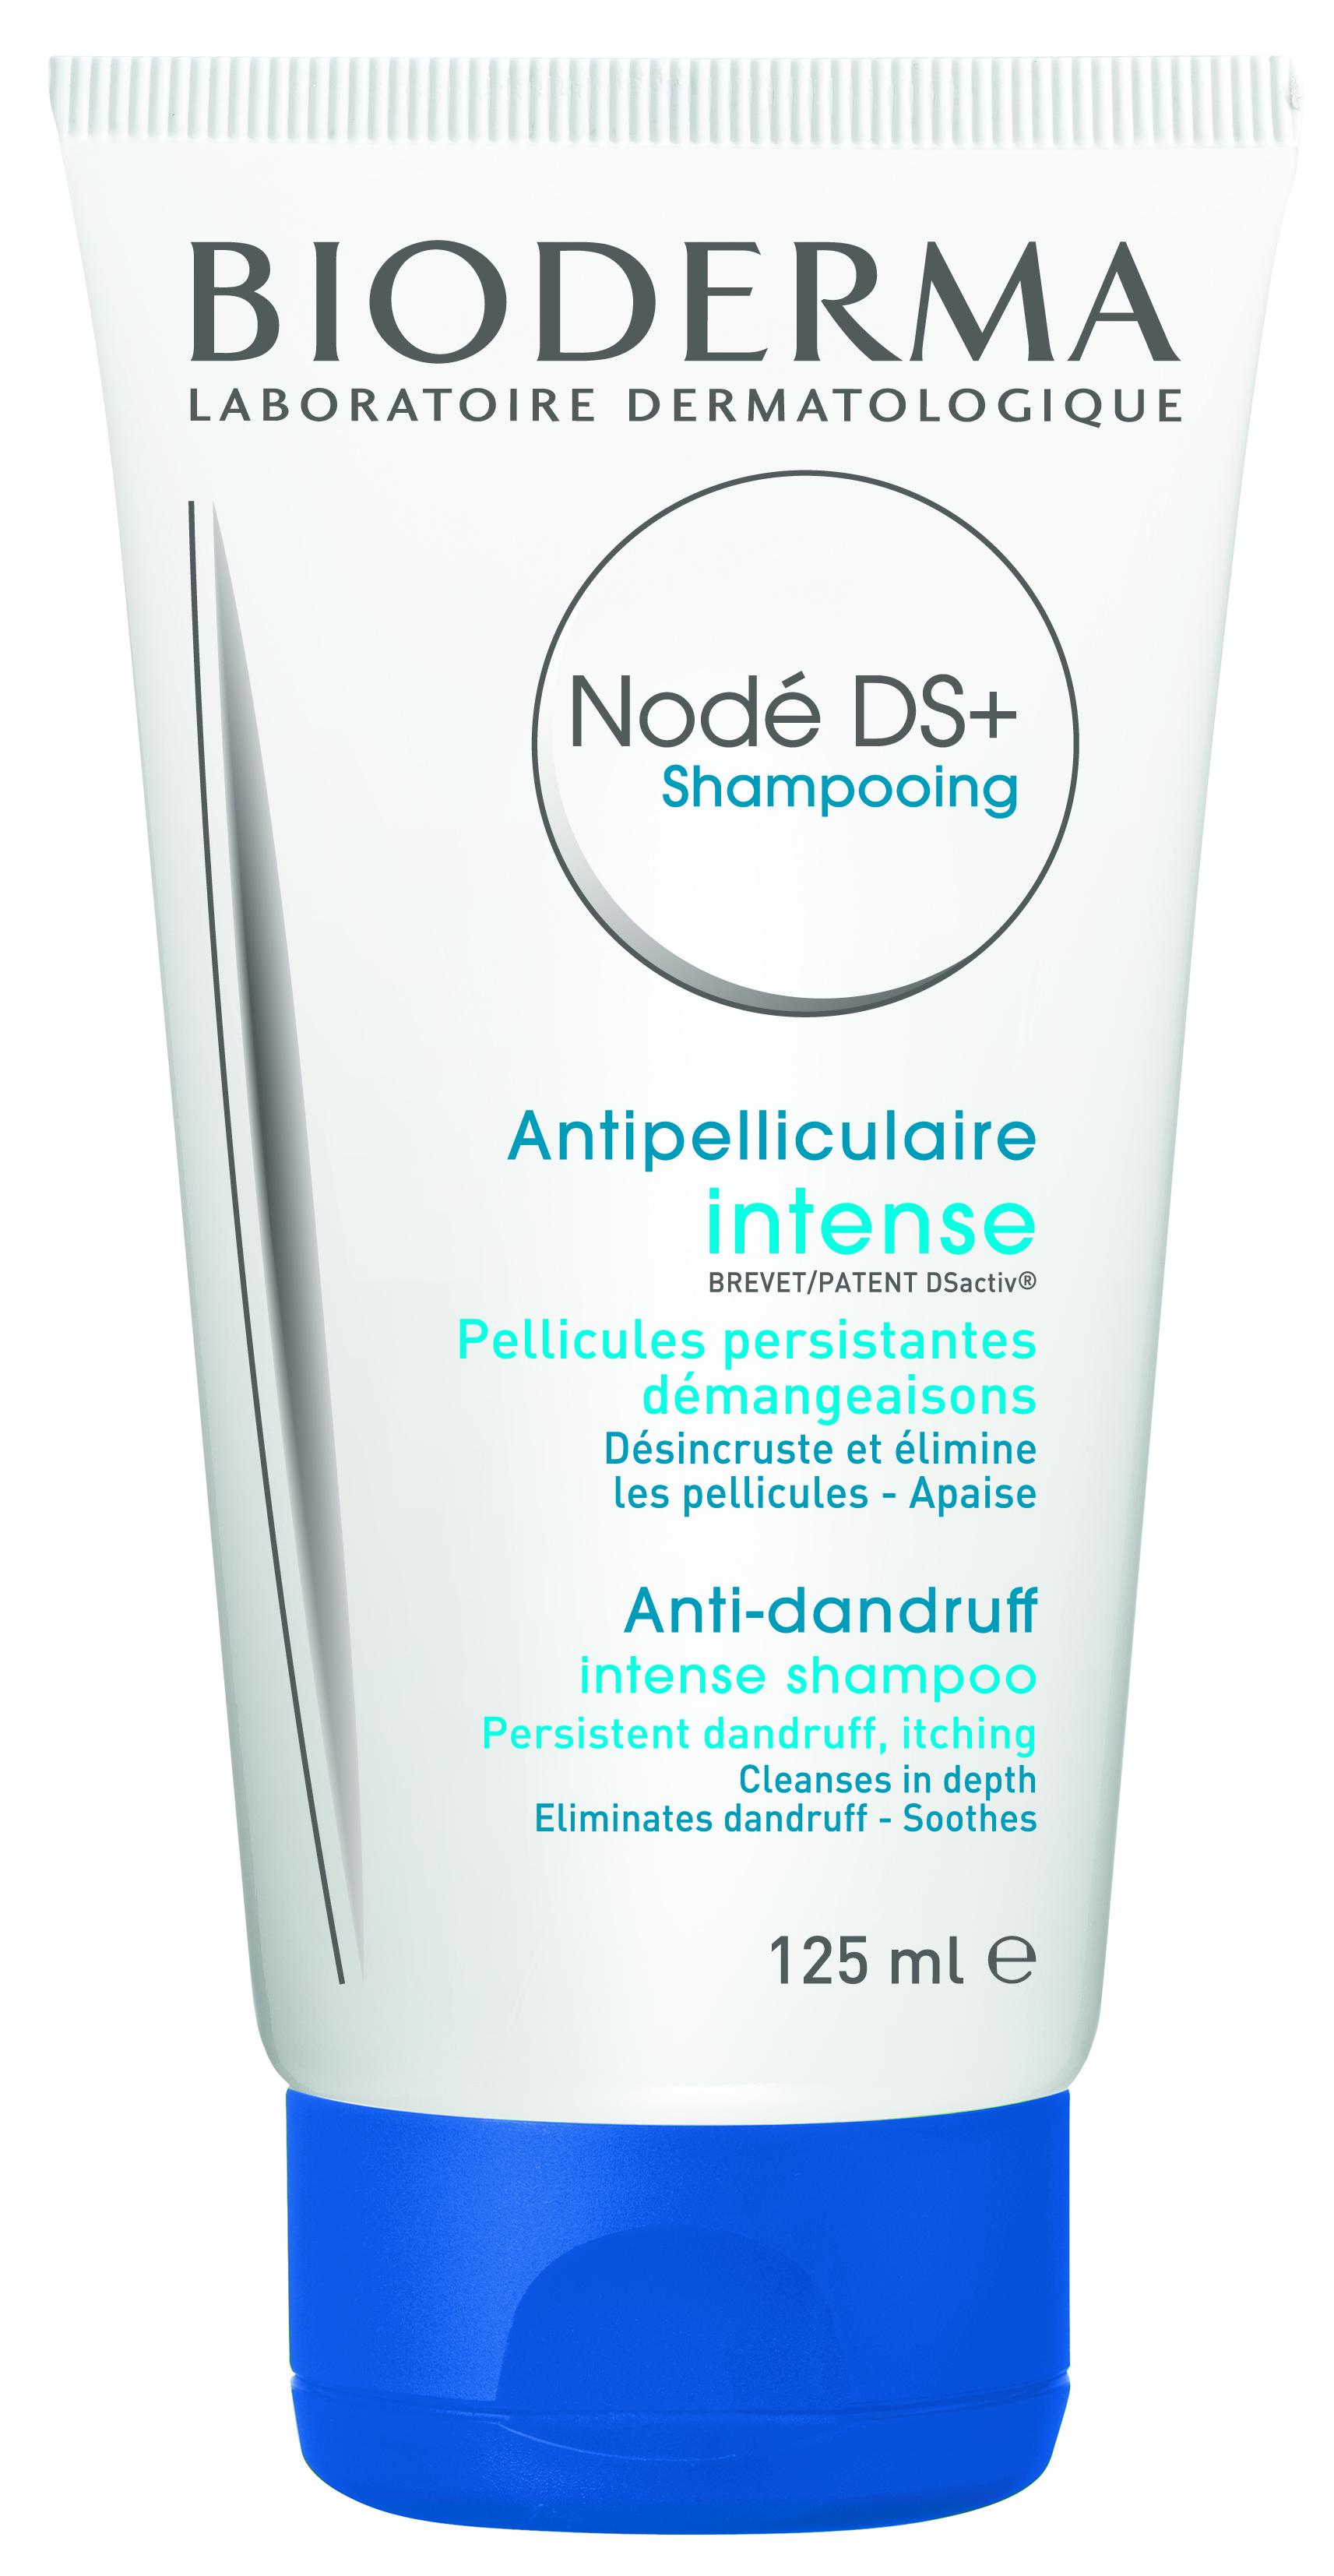 Bioderma Node DS+ Shampoo – Σαμπουάν Κατά της Σμηγματορροϊκής Δερματίτιδας 125ml